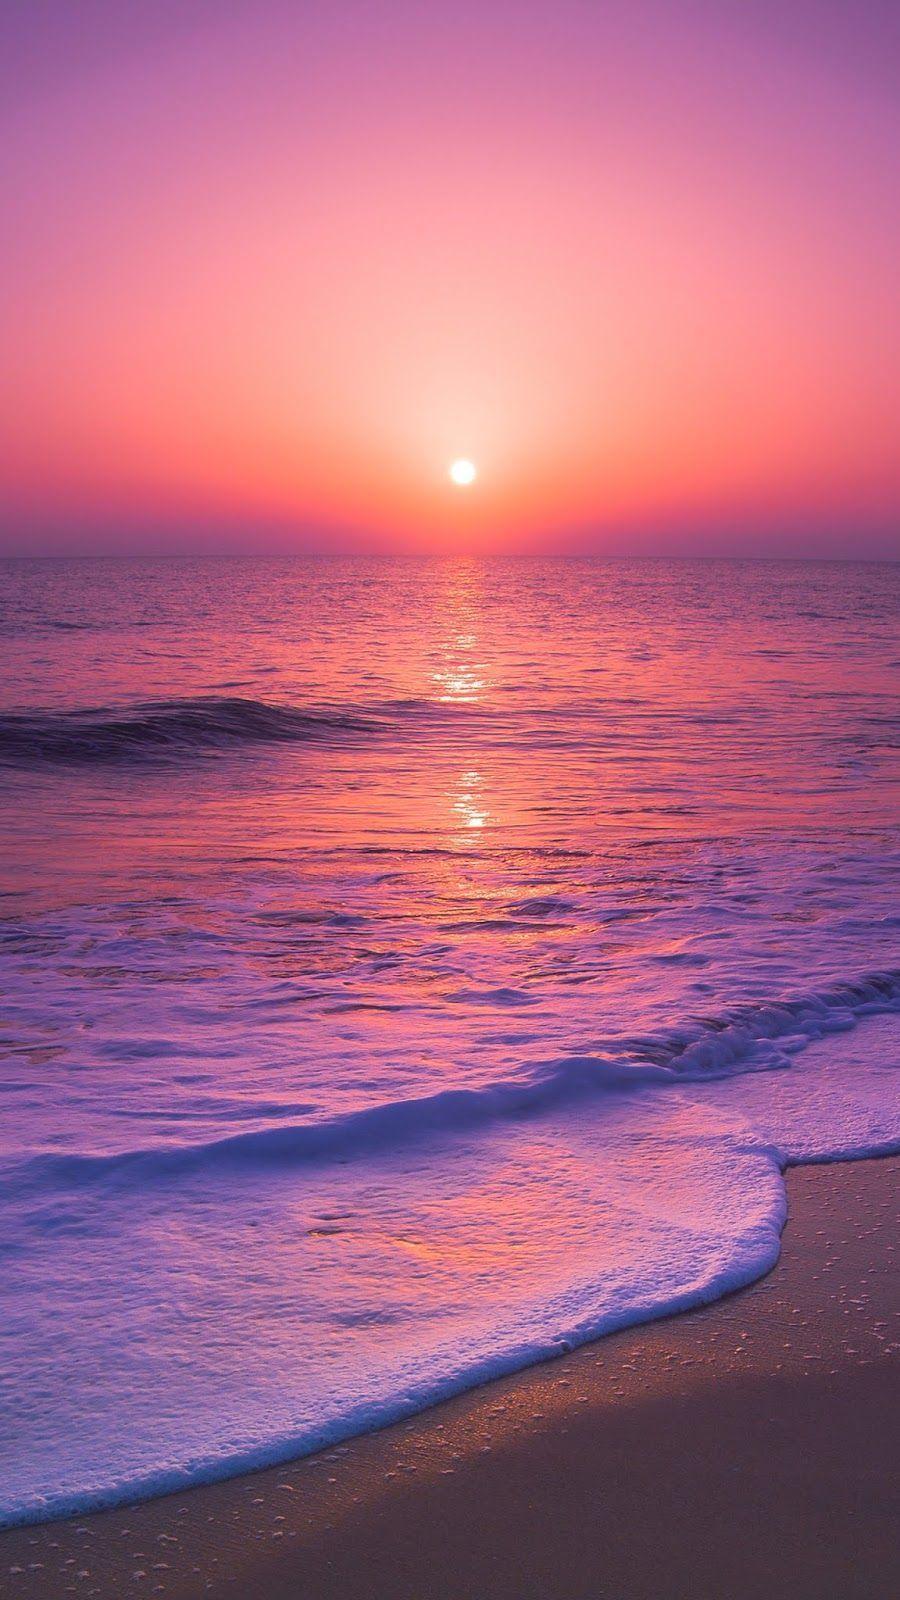 Sonnenuntergang Strandtapete Sonnenuntergang Strandtapete Wallpaper Pantai Wallpaper Yang Indah Wallpaper Alam Yang Indah